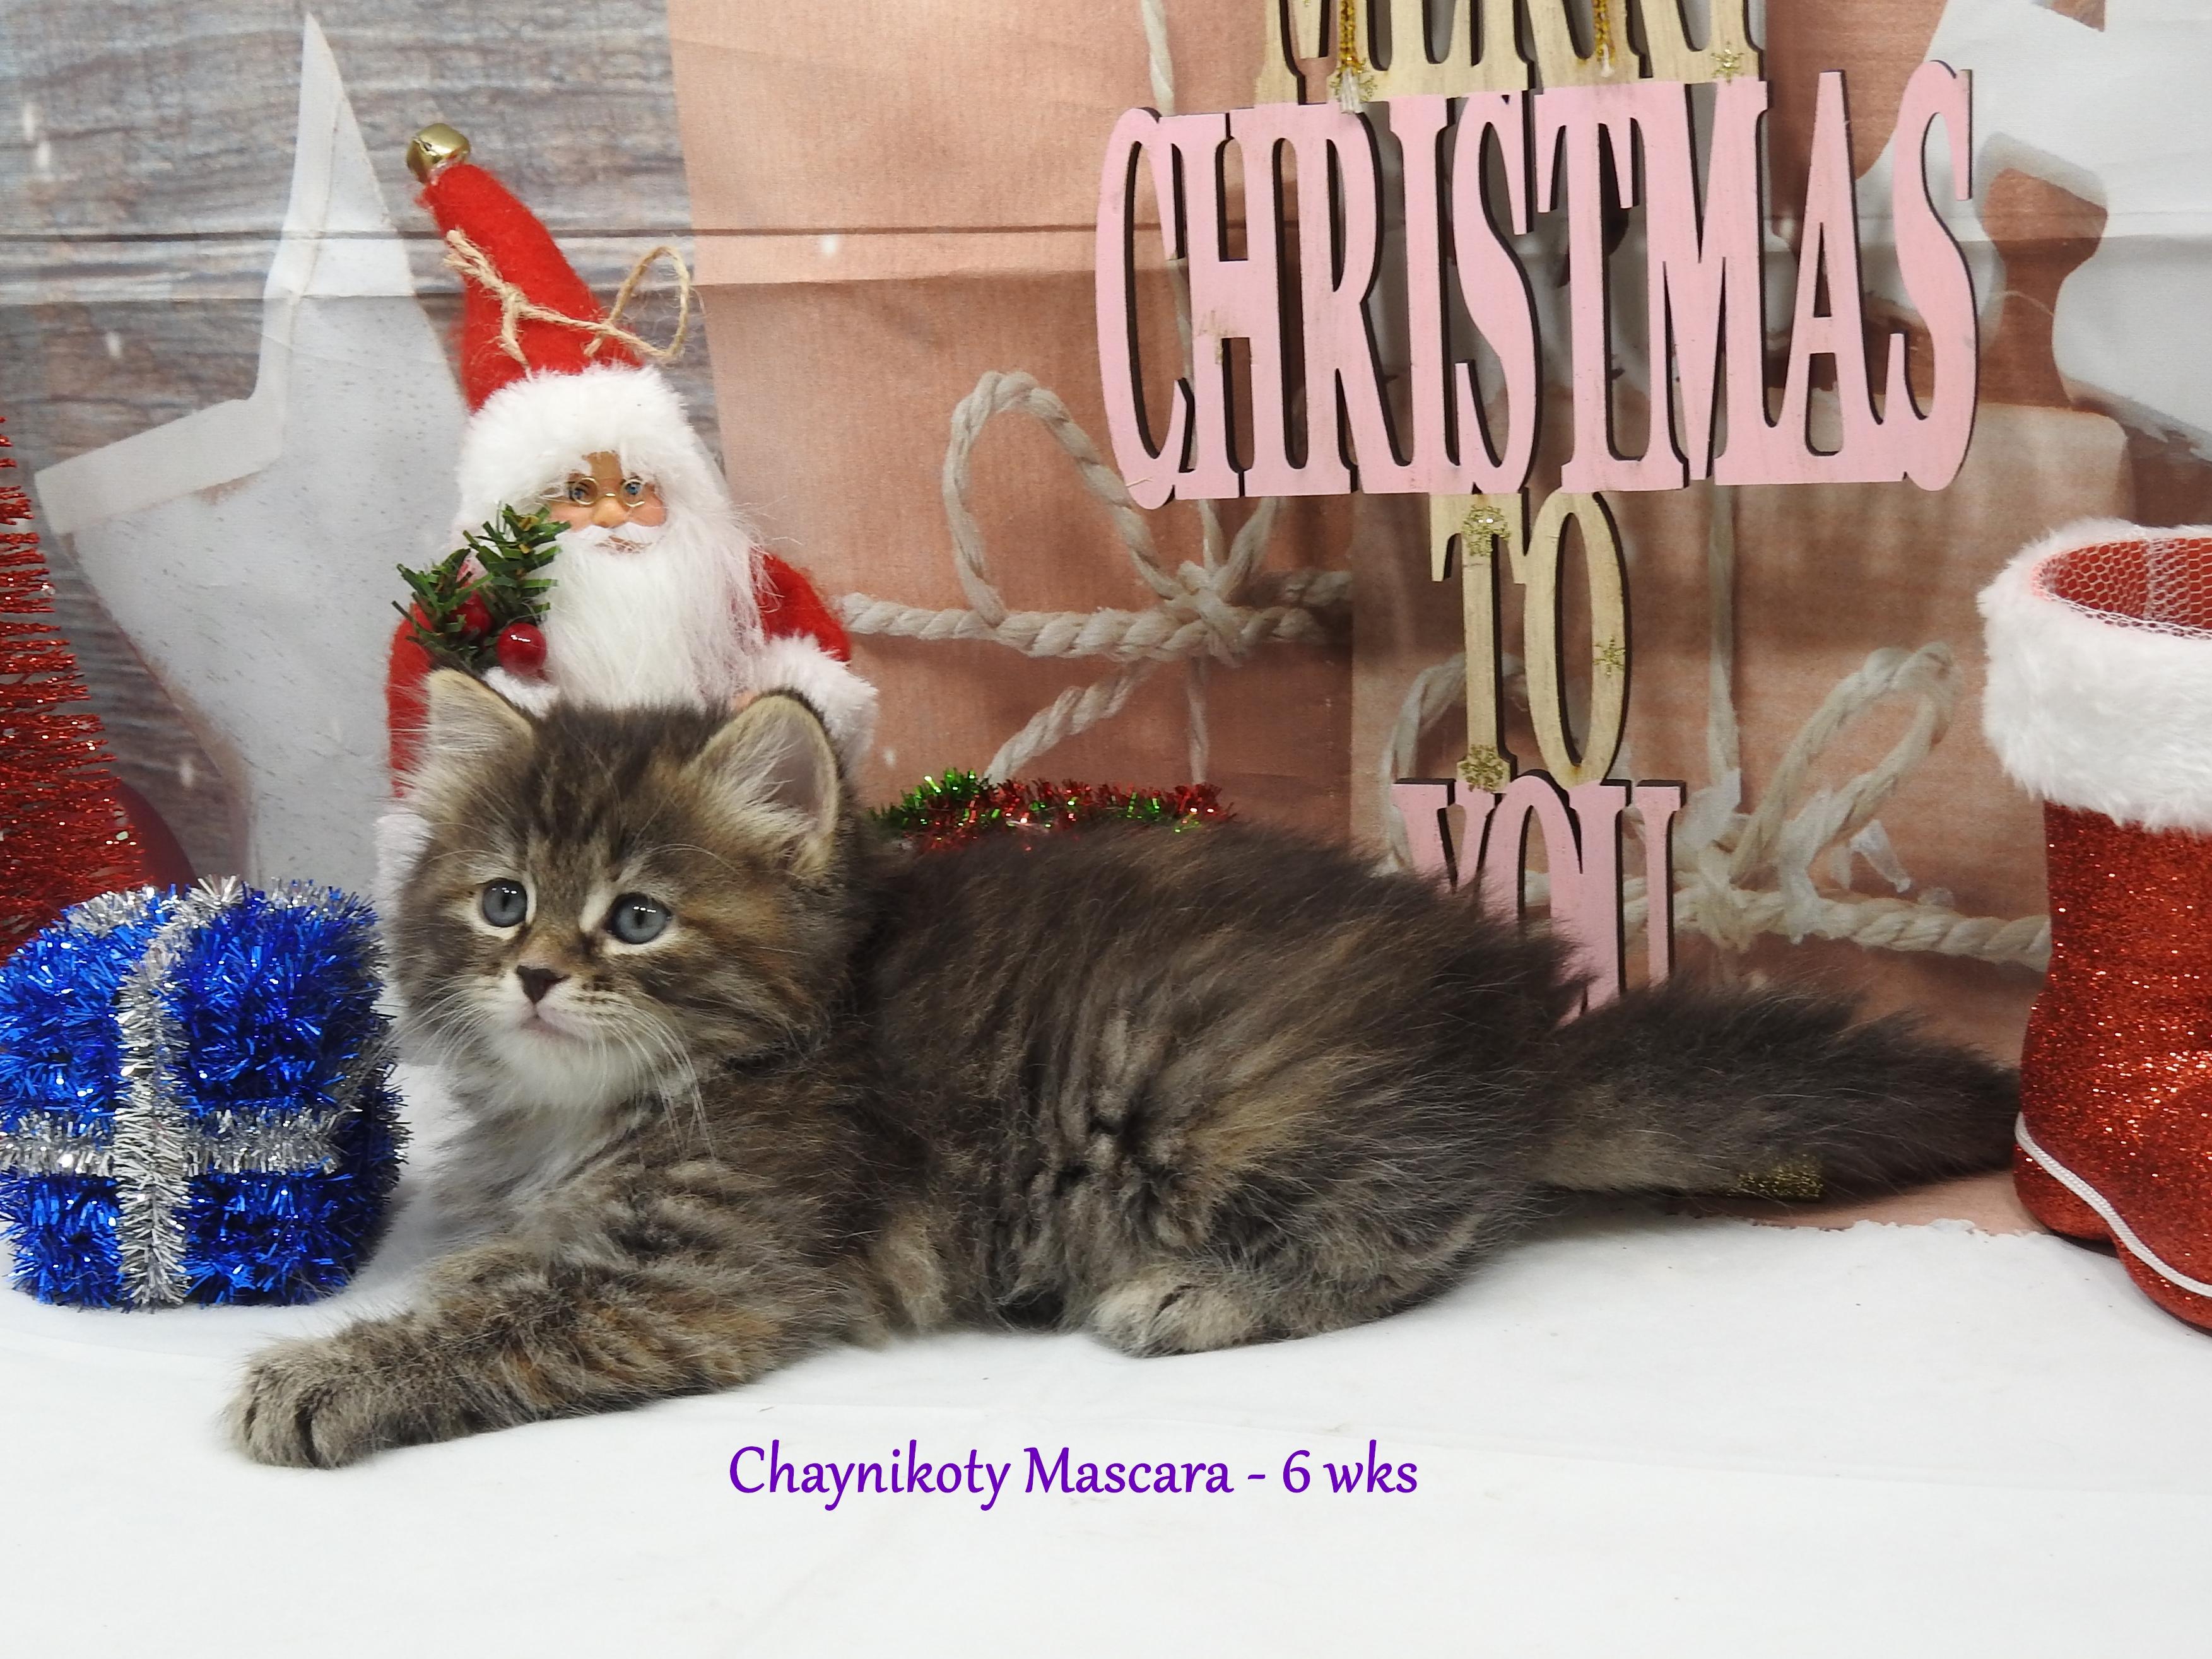 Chaynikoty Mascara - 6 wks13